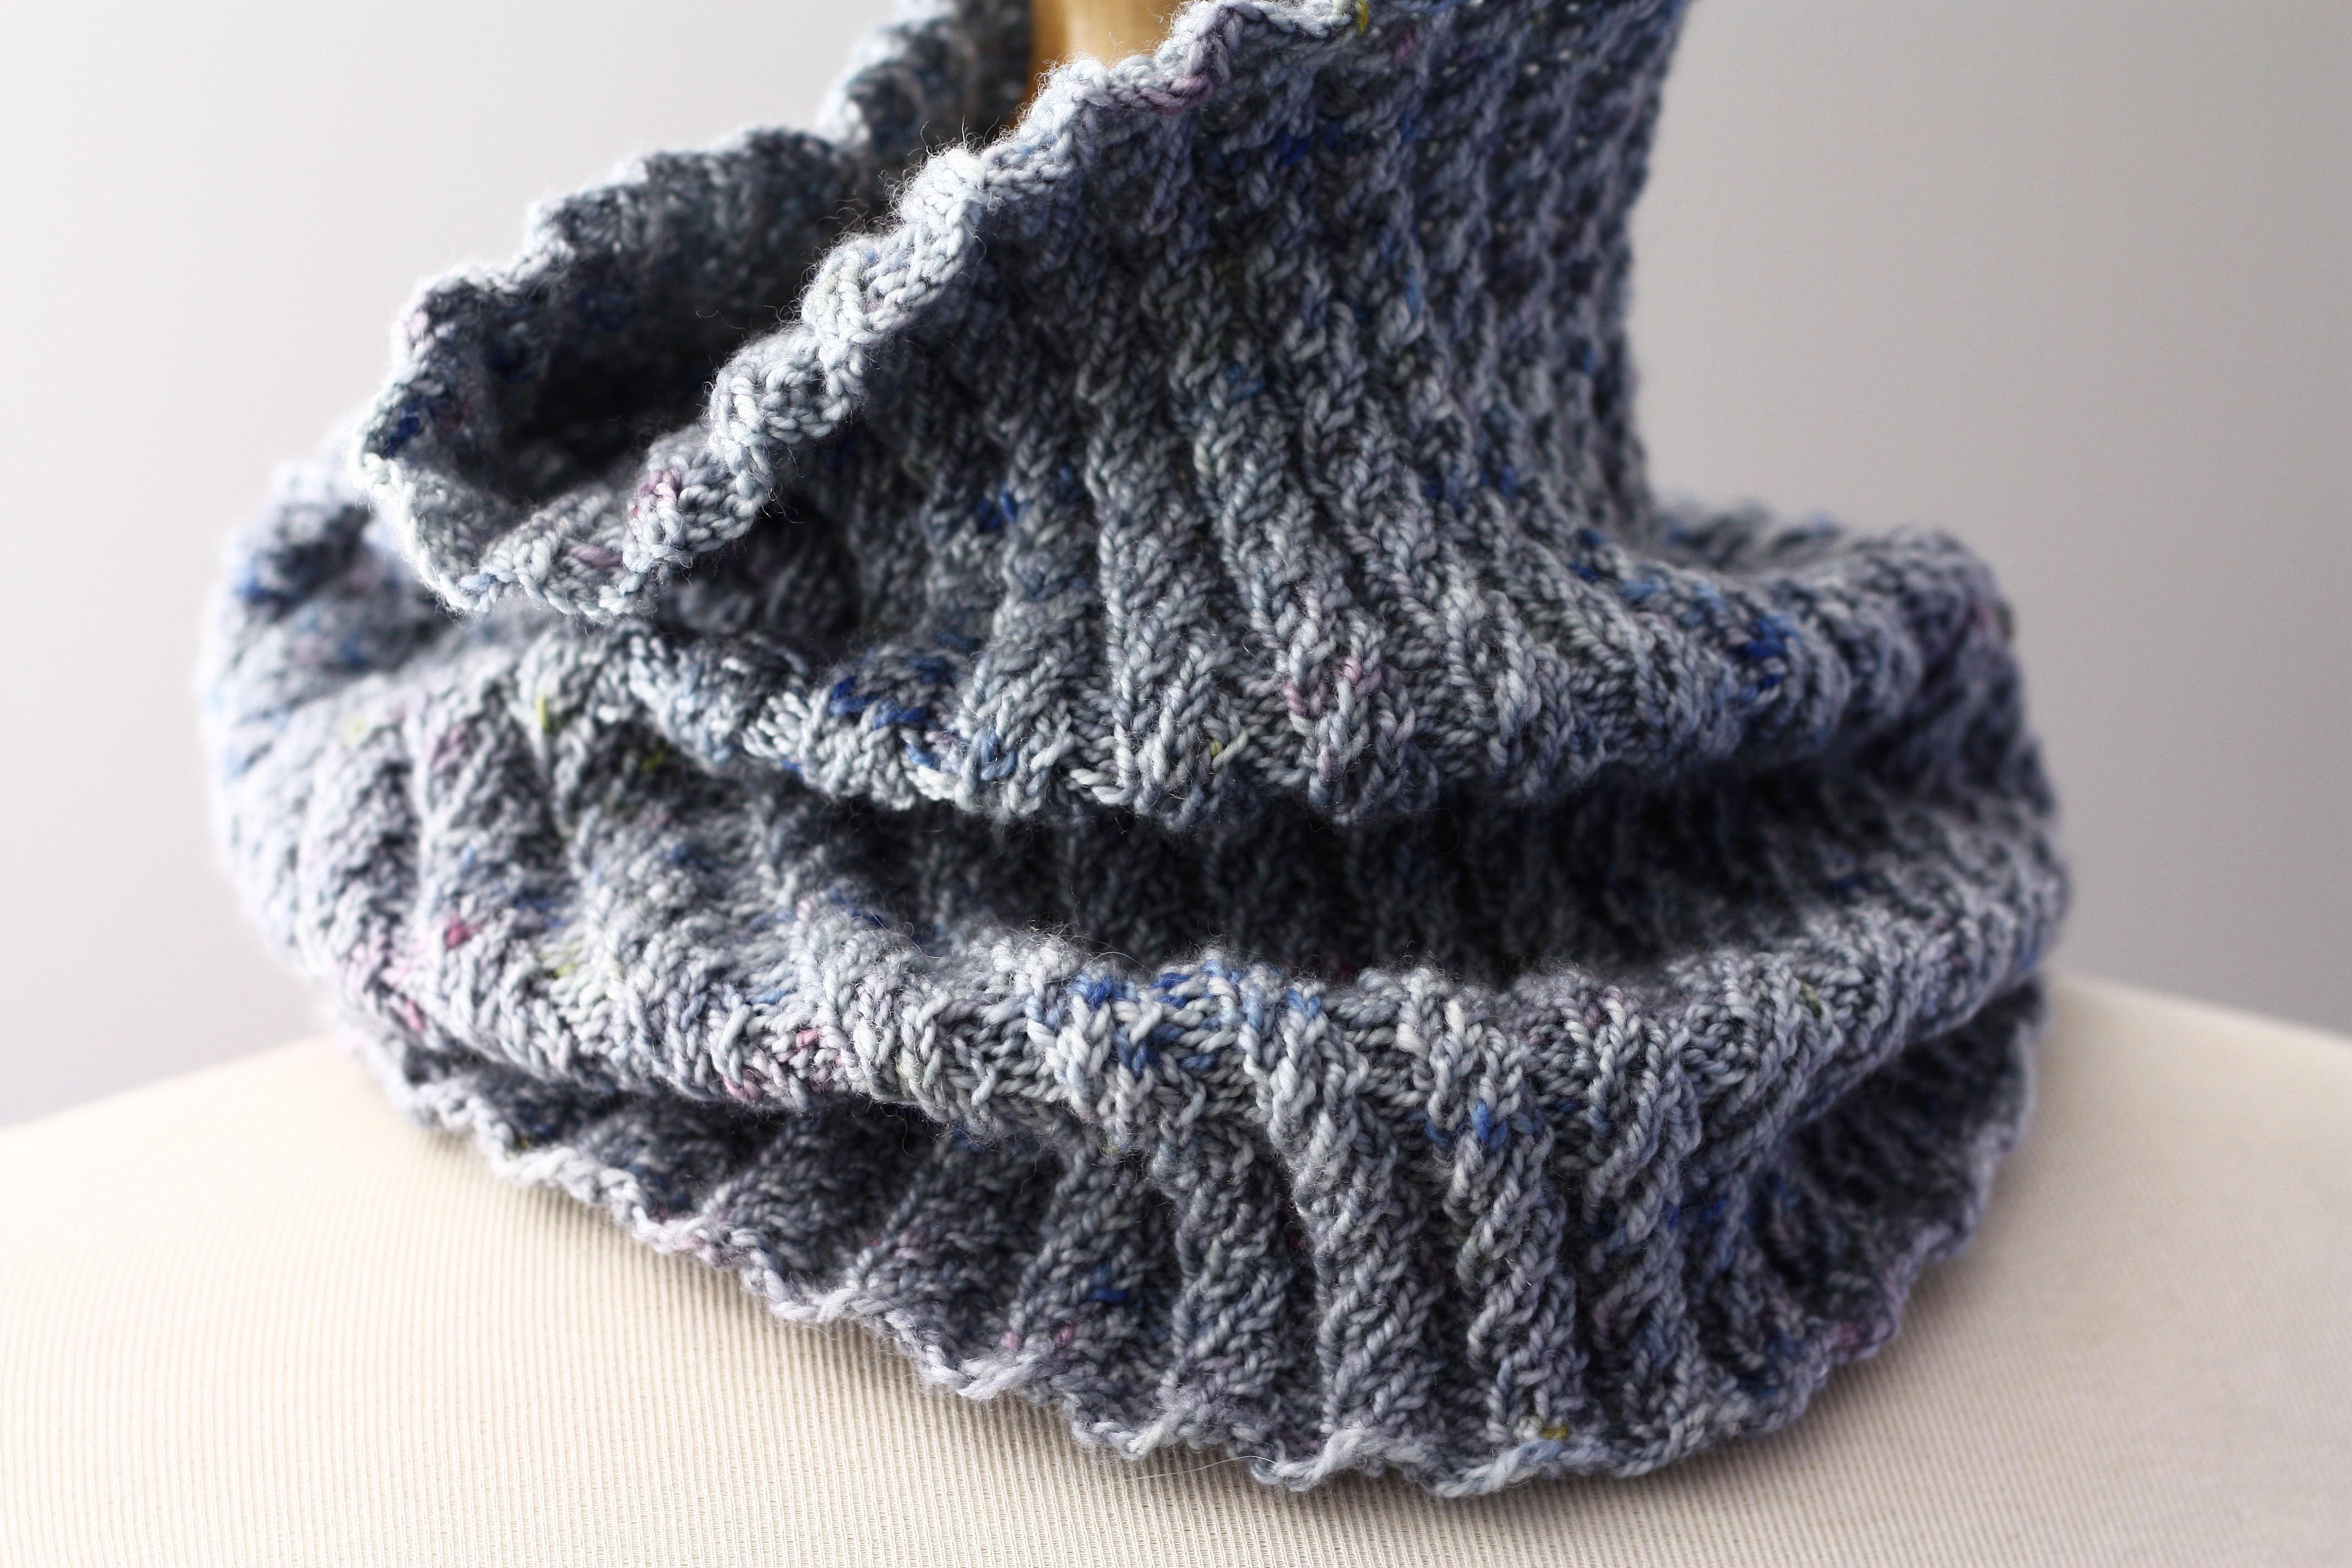 tricoter a l'americaine